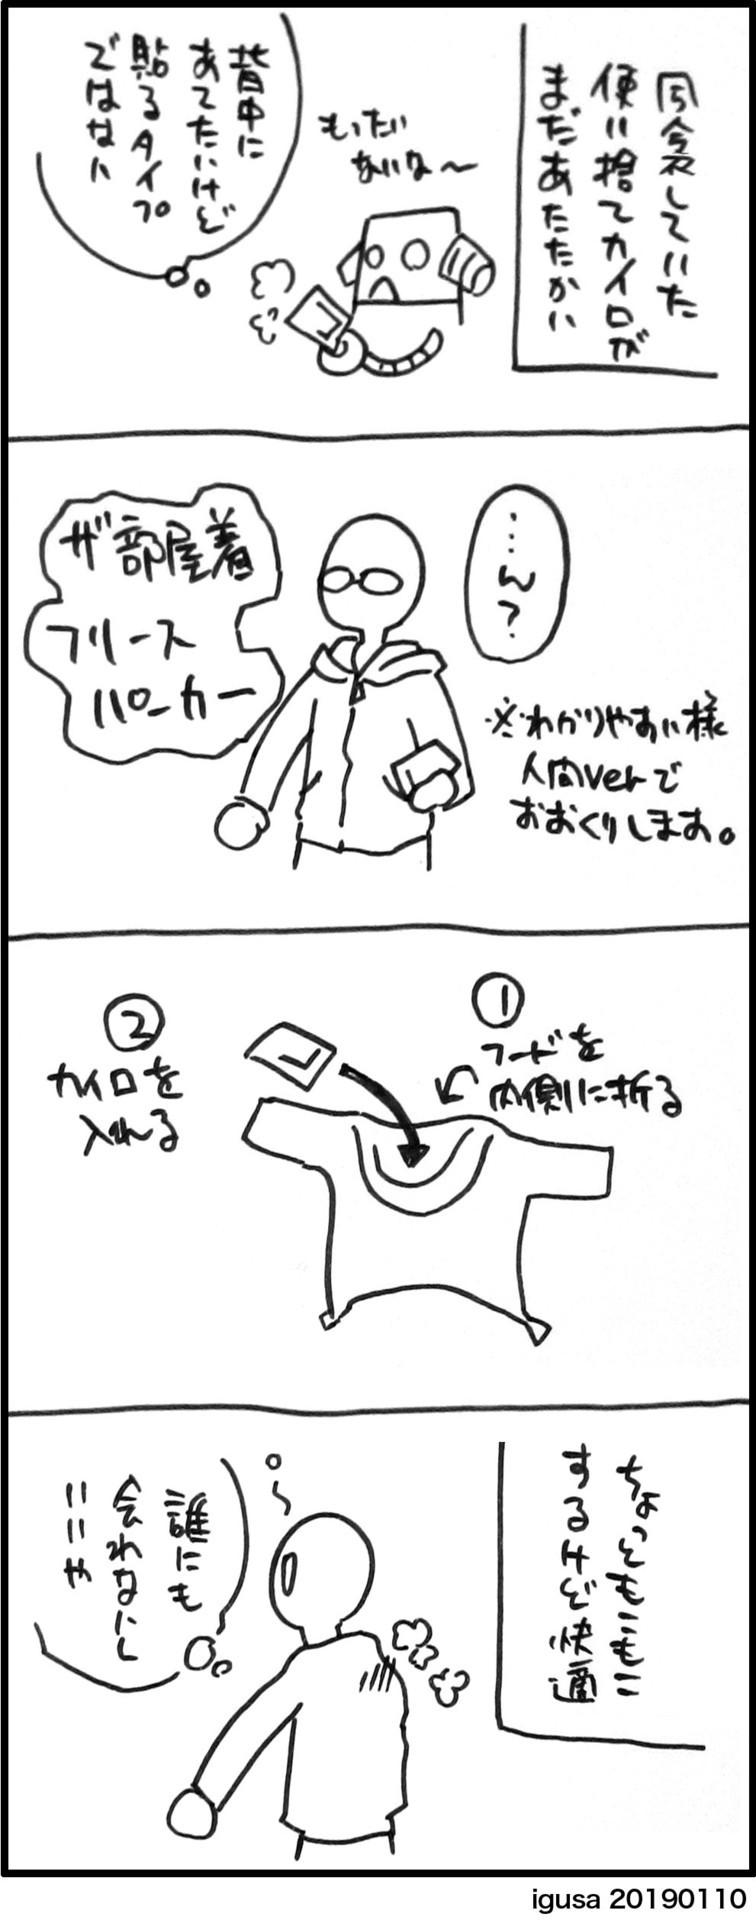 h4r190110.jpg